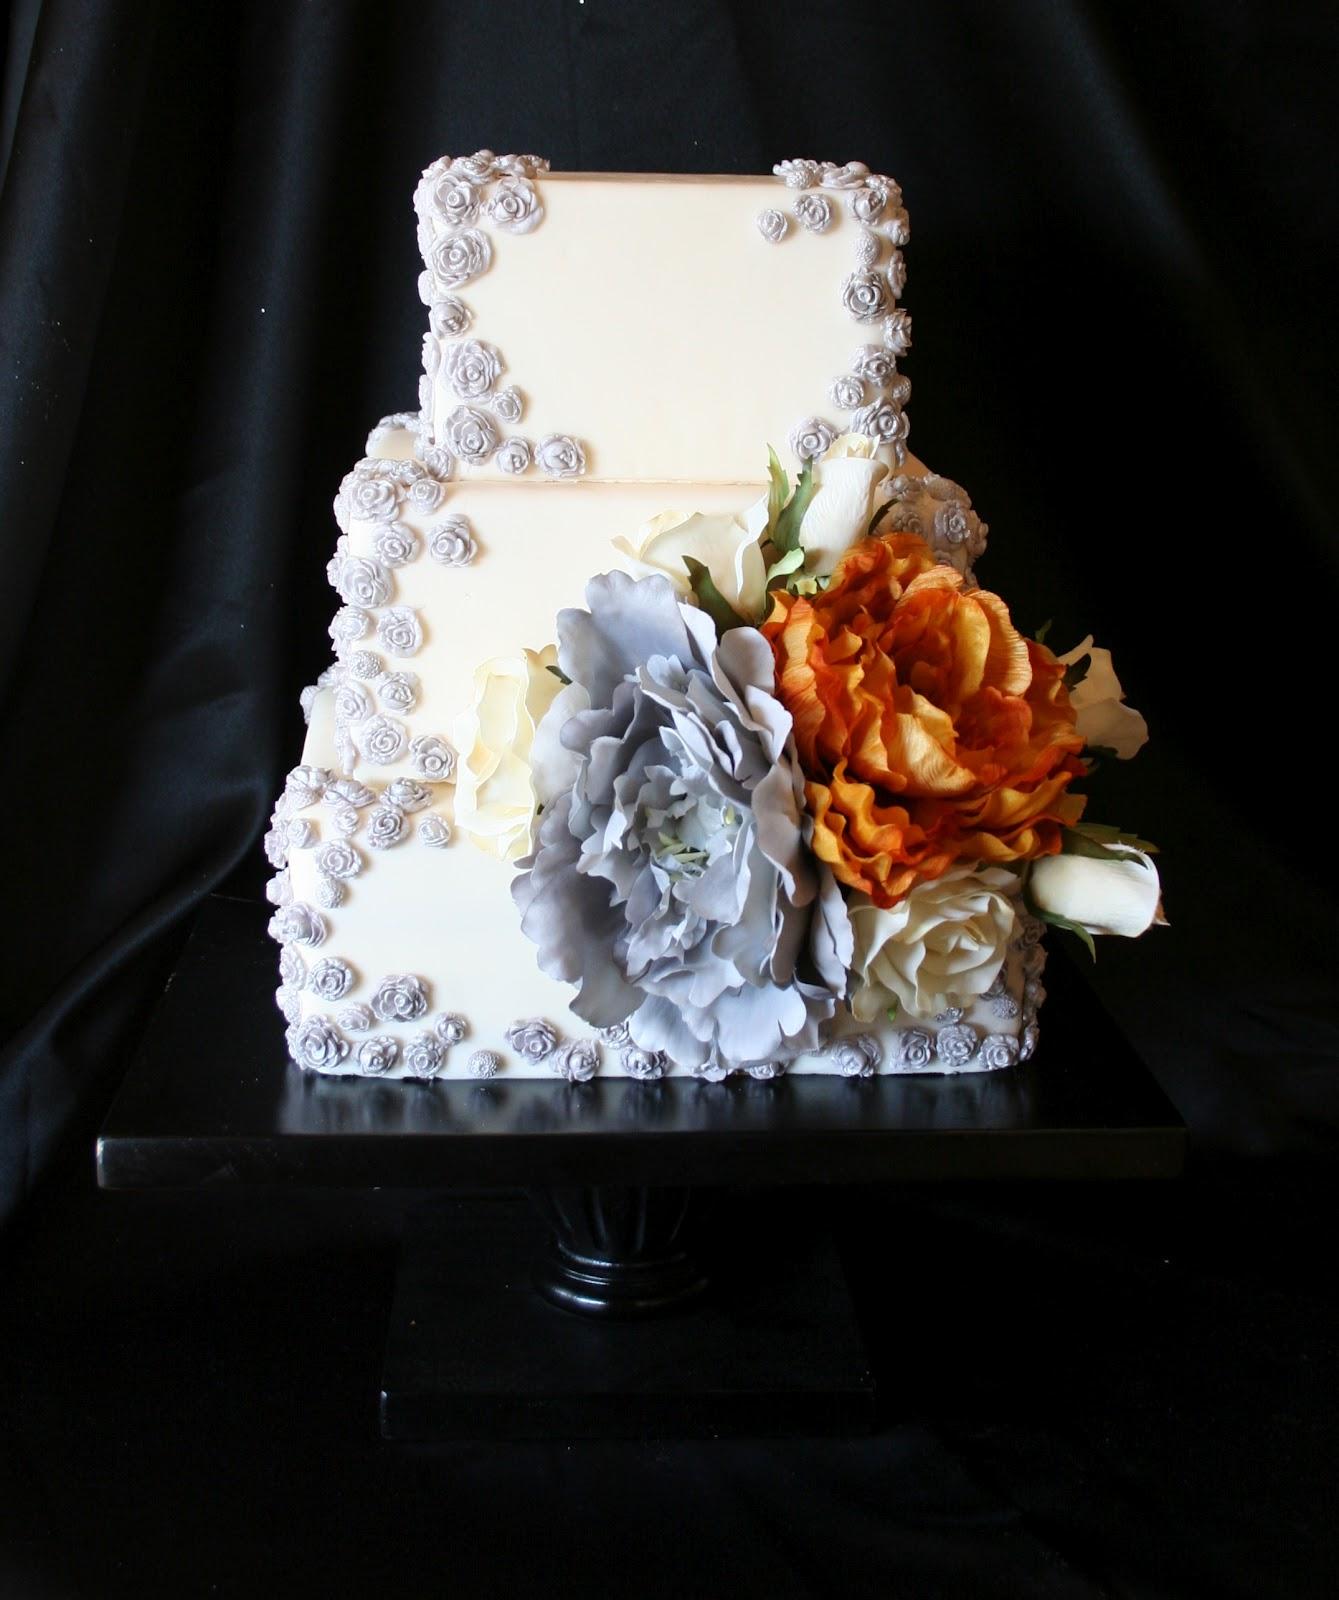 29 Wedding Cakes With Vintage Vibes: The Cake Cottage: Vintage Romance Wedding